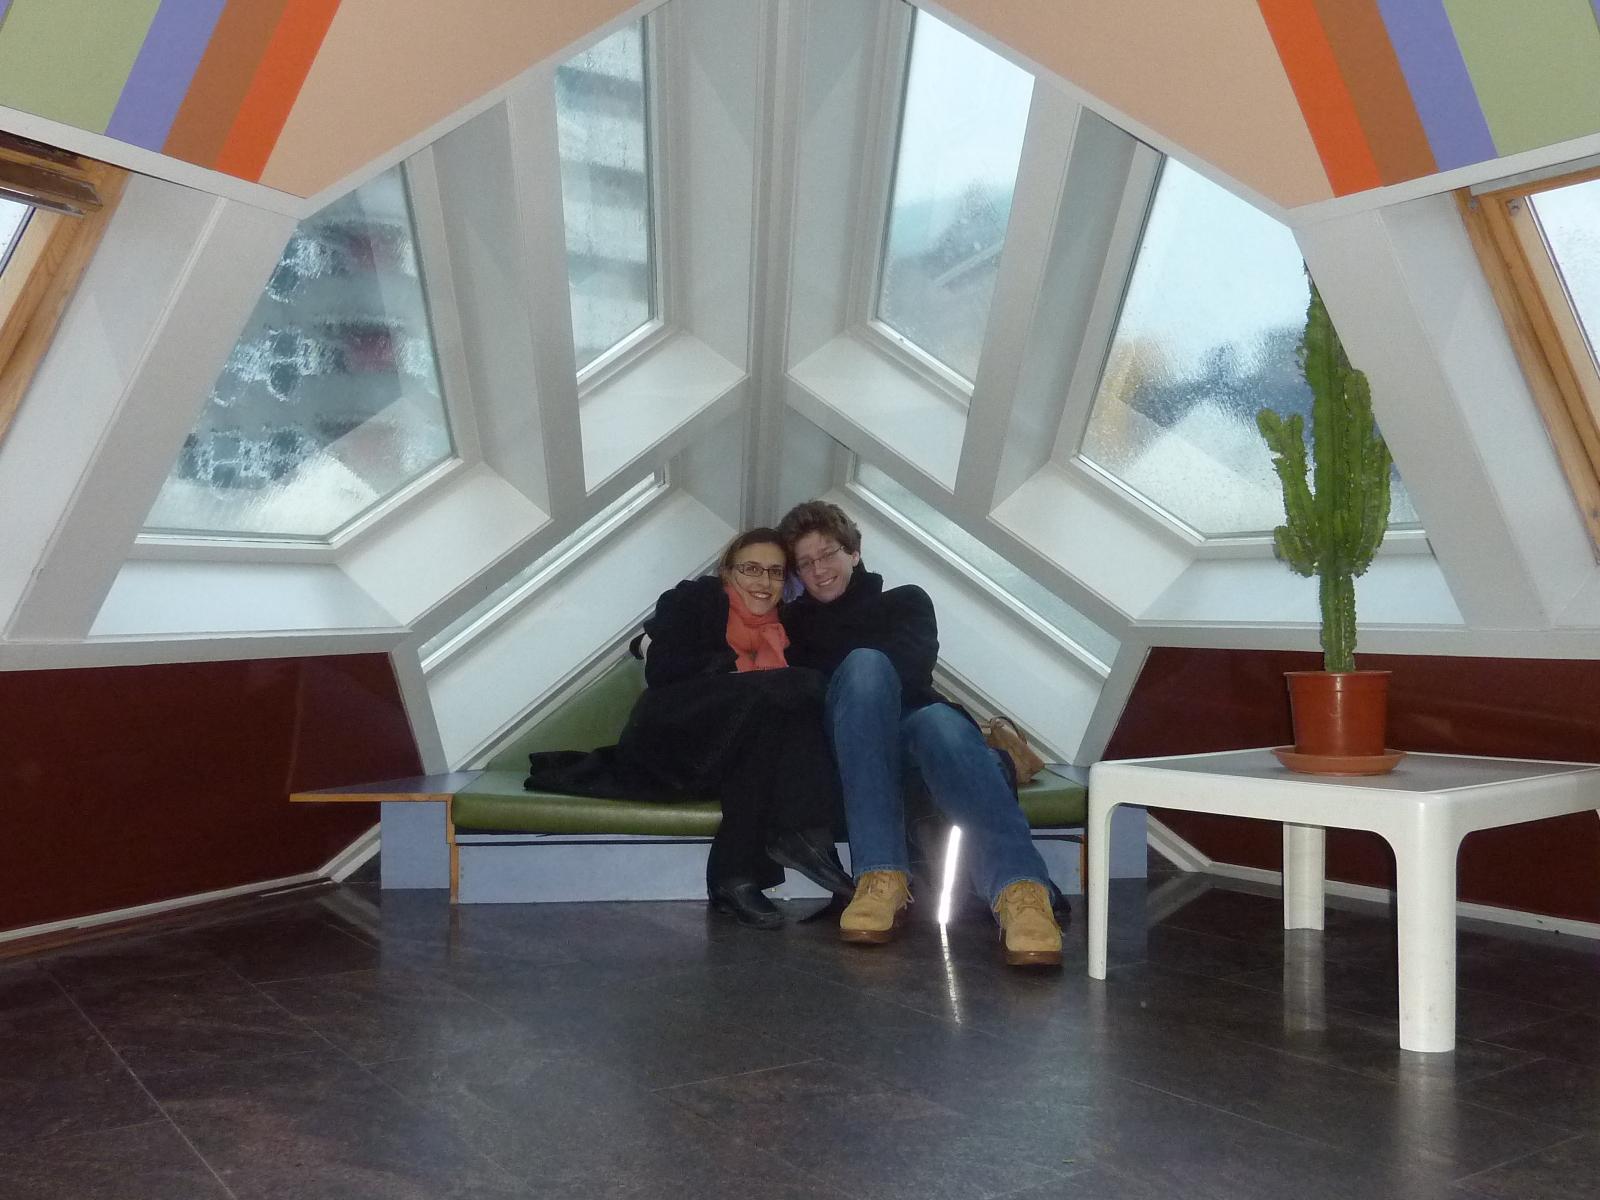 rotterdam en amoureux 21 et 22 d cembre 2013 smiling around the world. Black Bedroom Furniture Sets. Home Design Ideas